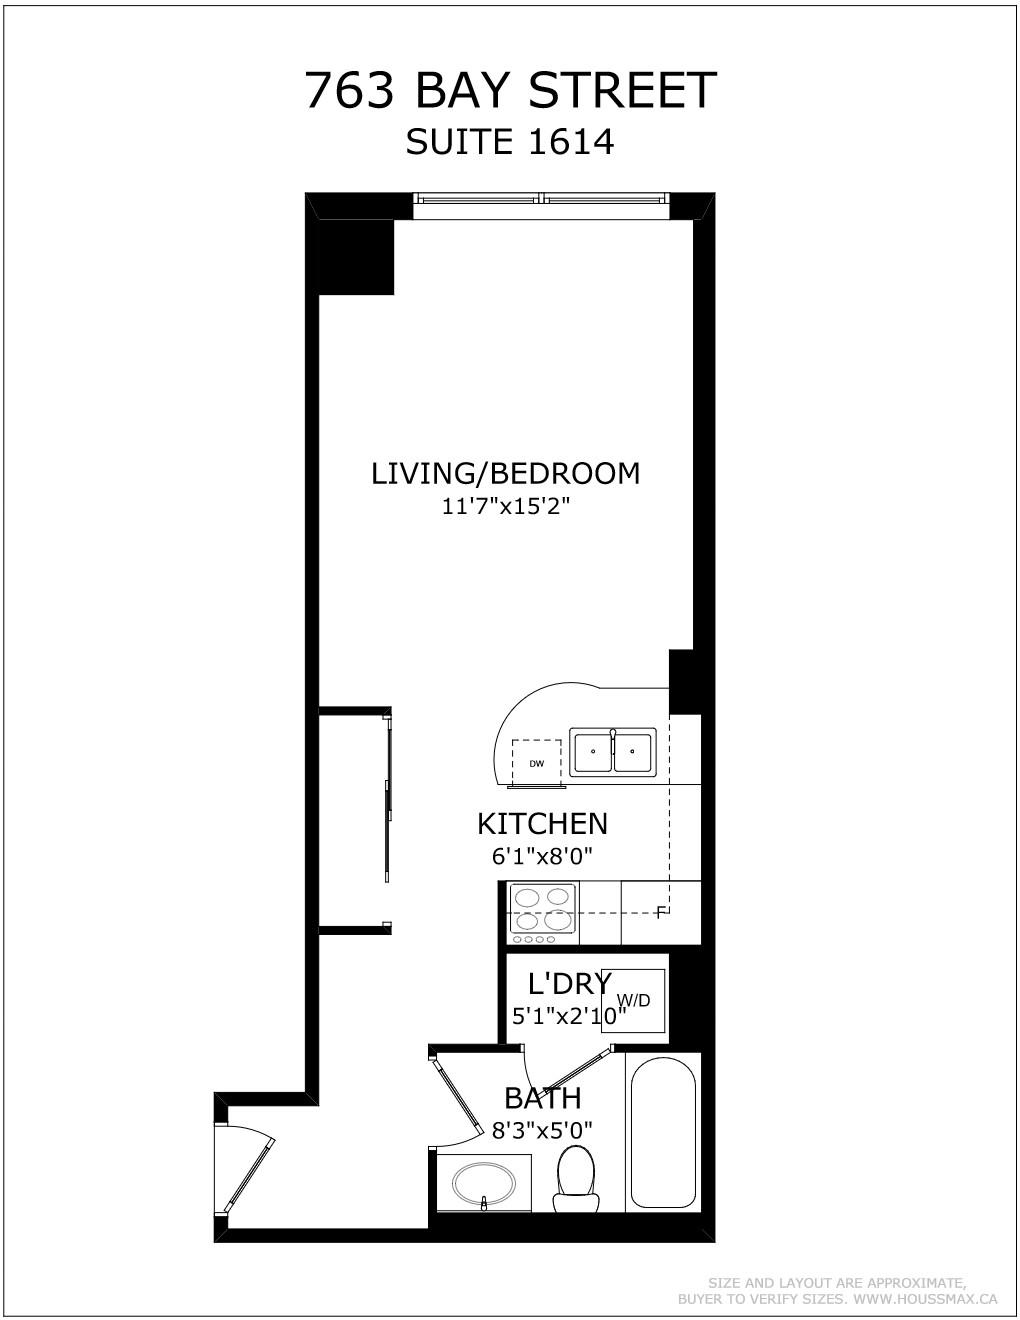 Floor plans for 763 Bay St Unit 1614.